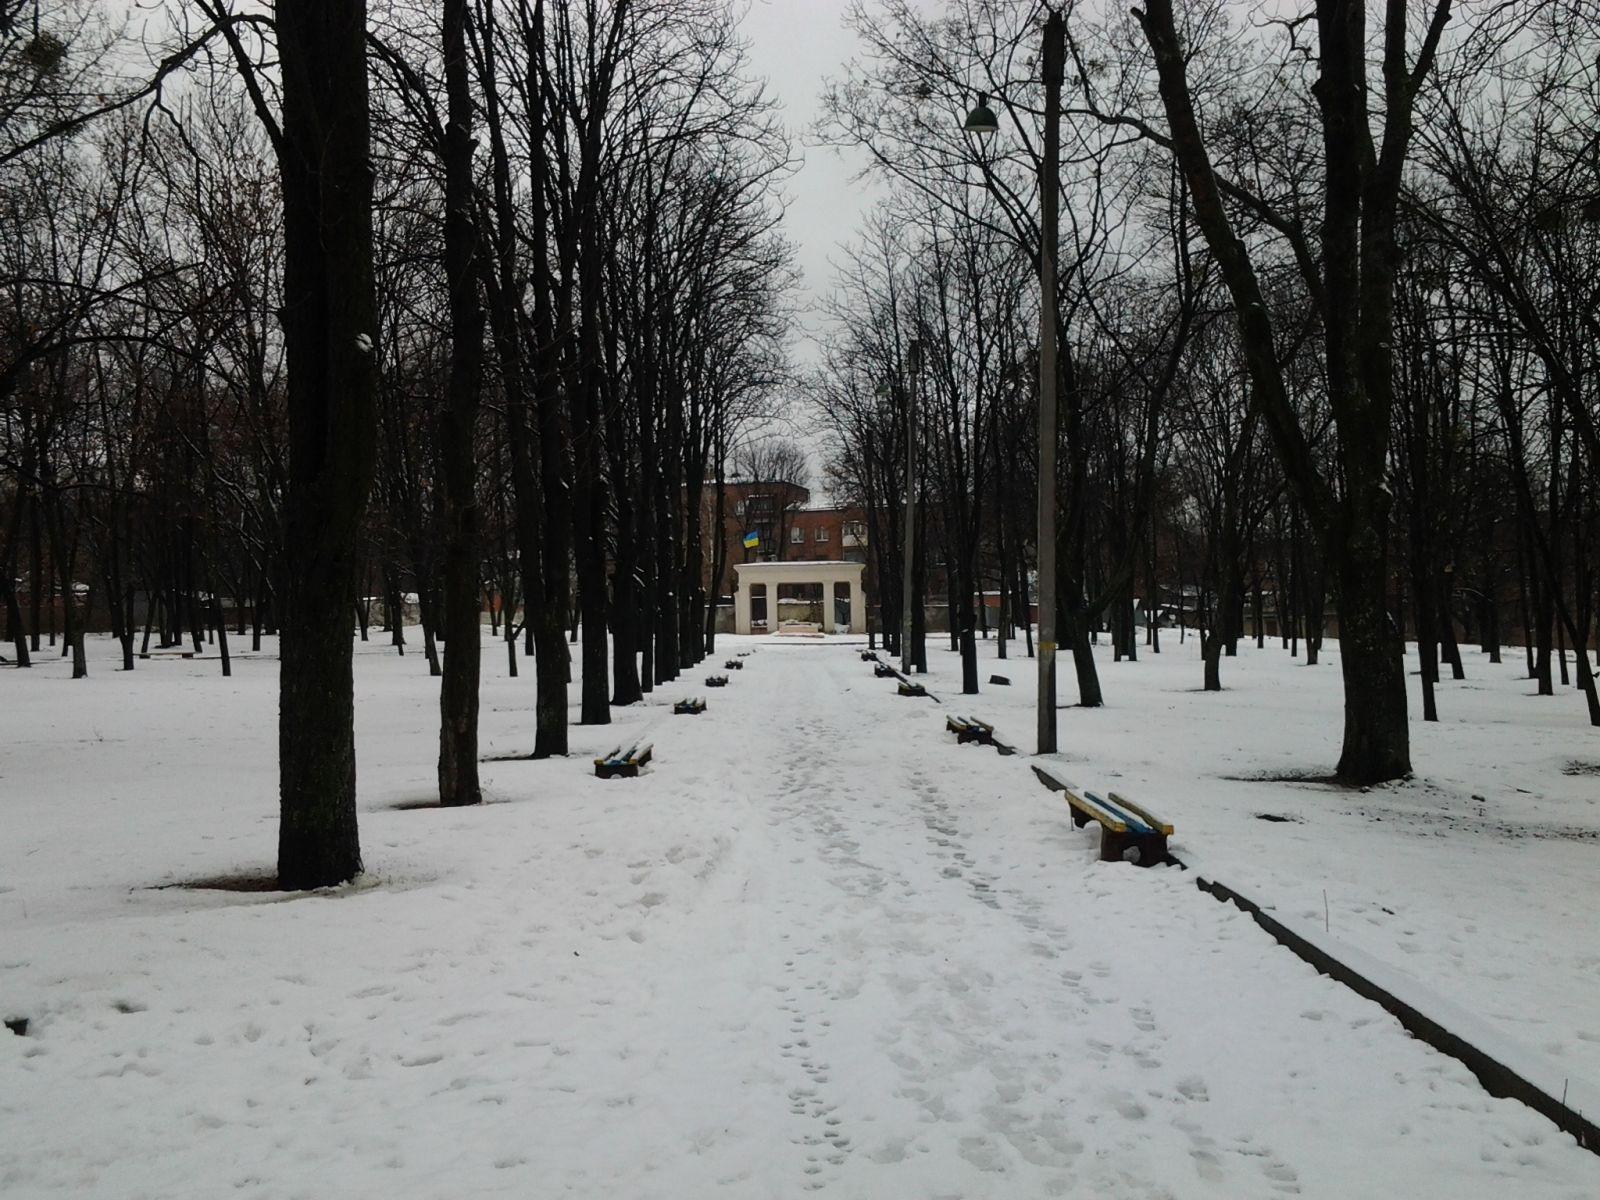 http://dozor.kharkov.ua/content/documents/11578/1157781/images/20150120_114049.jpg